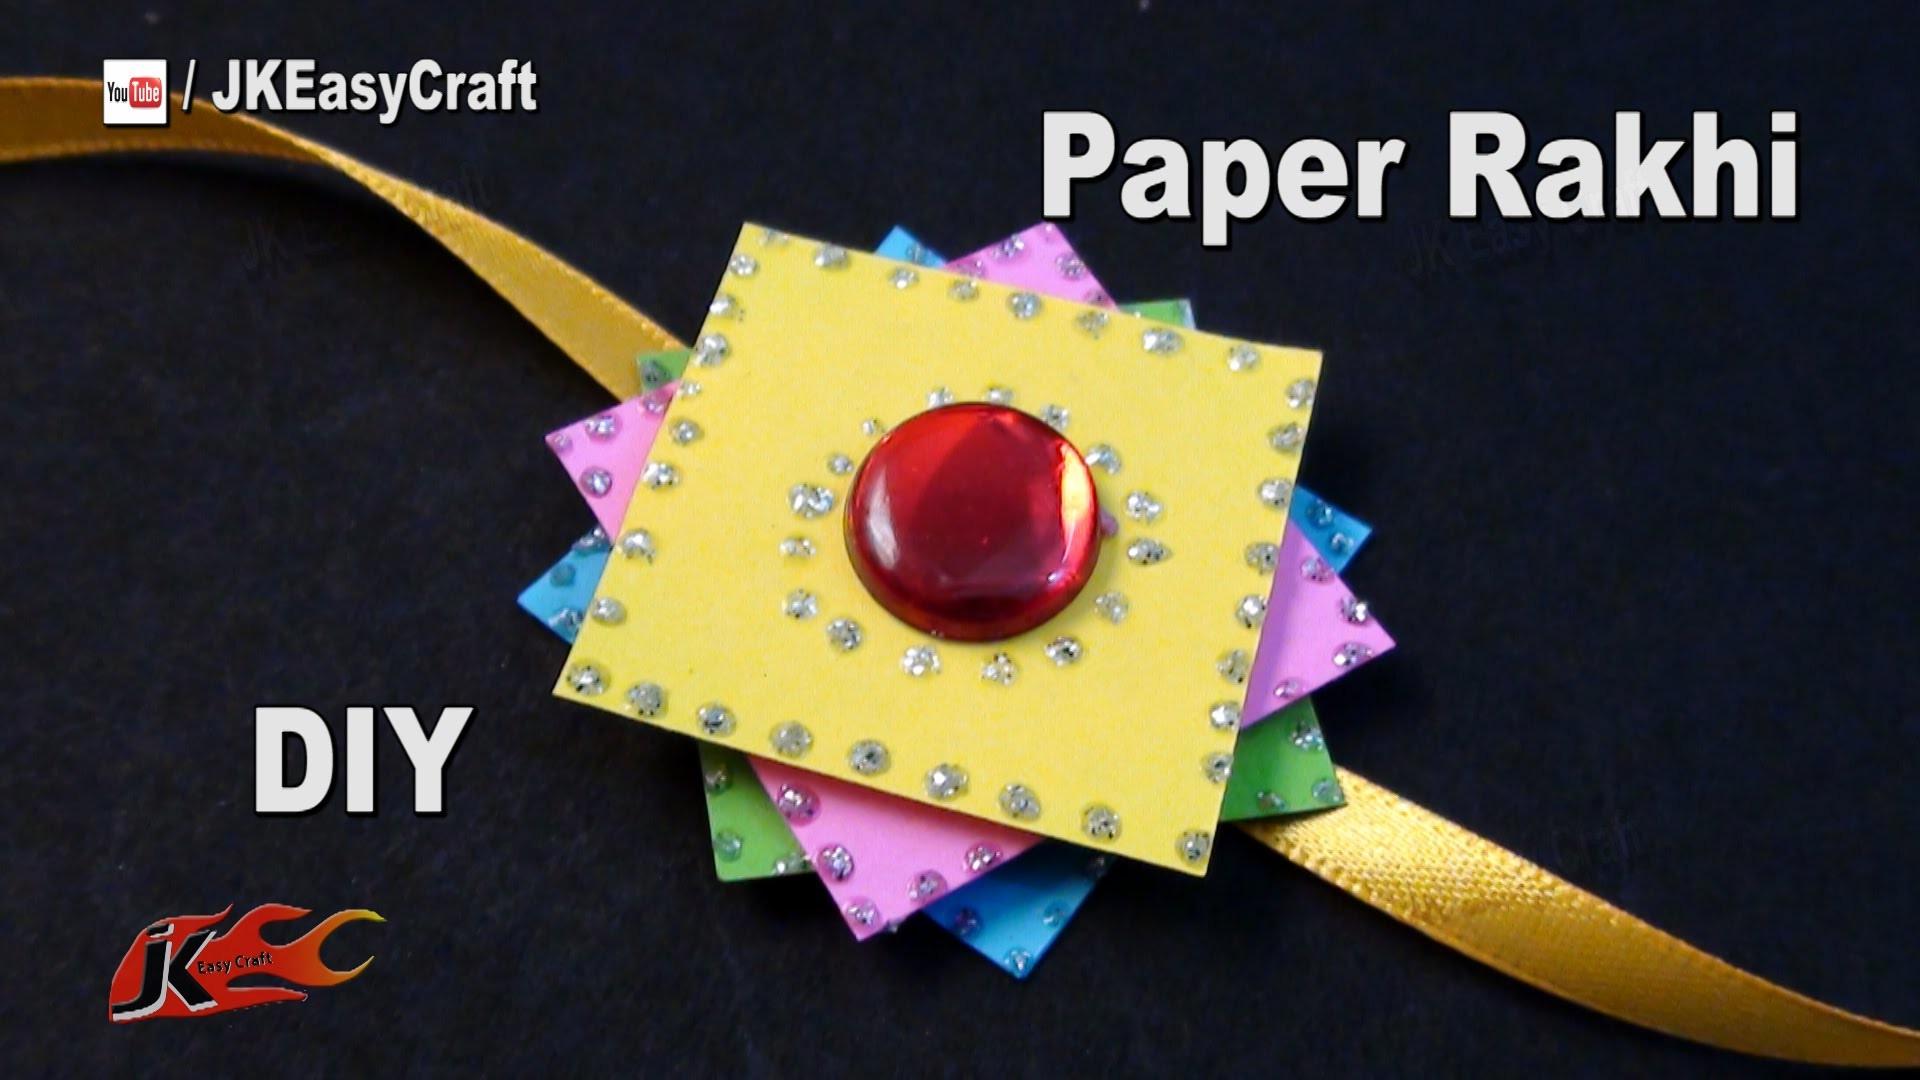 DIY Paper Rakhi for Raksha Bandhan | How to make | JK Easy Craft for kids 177